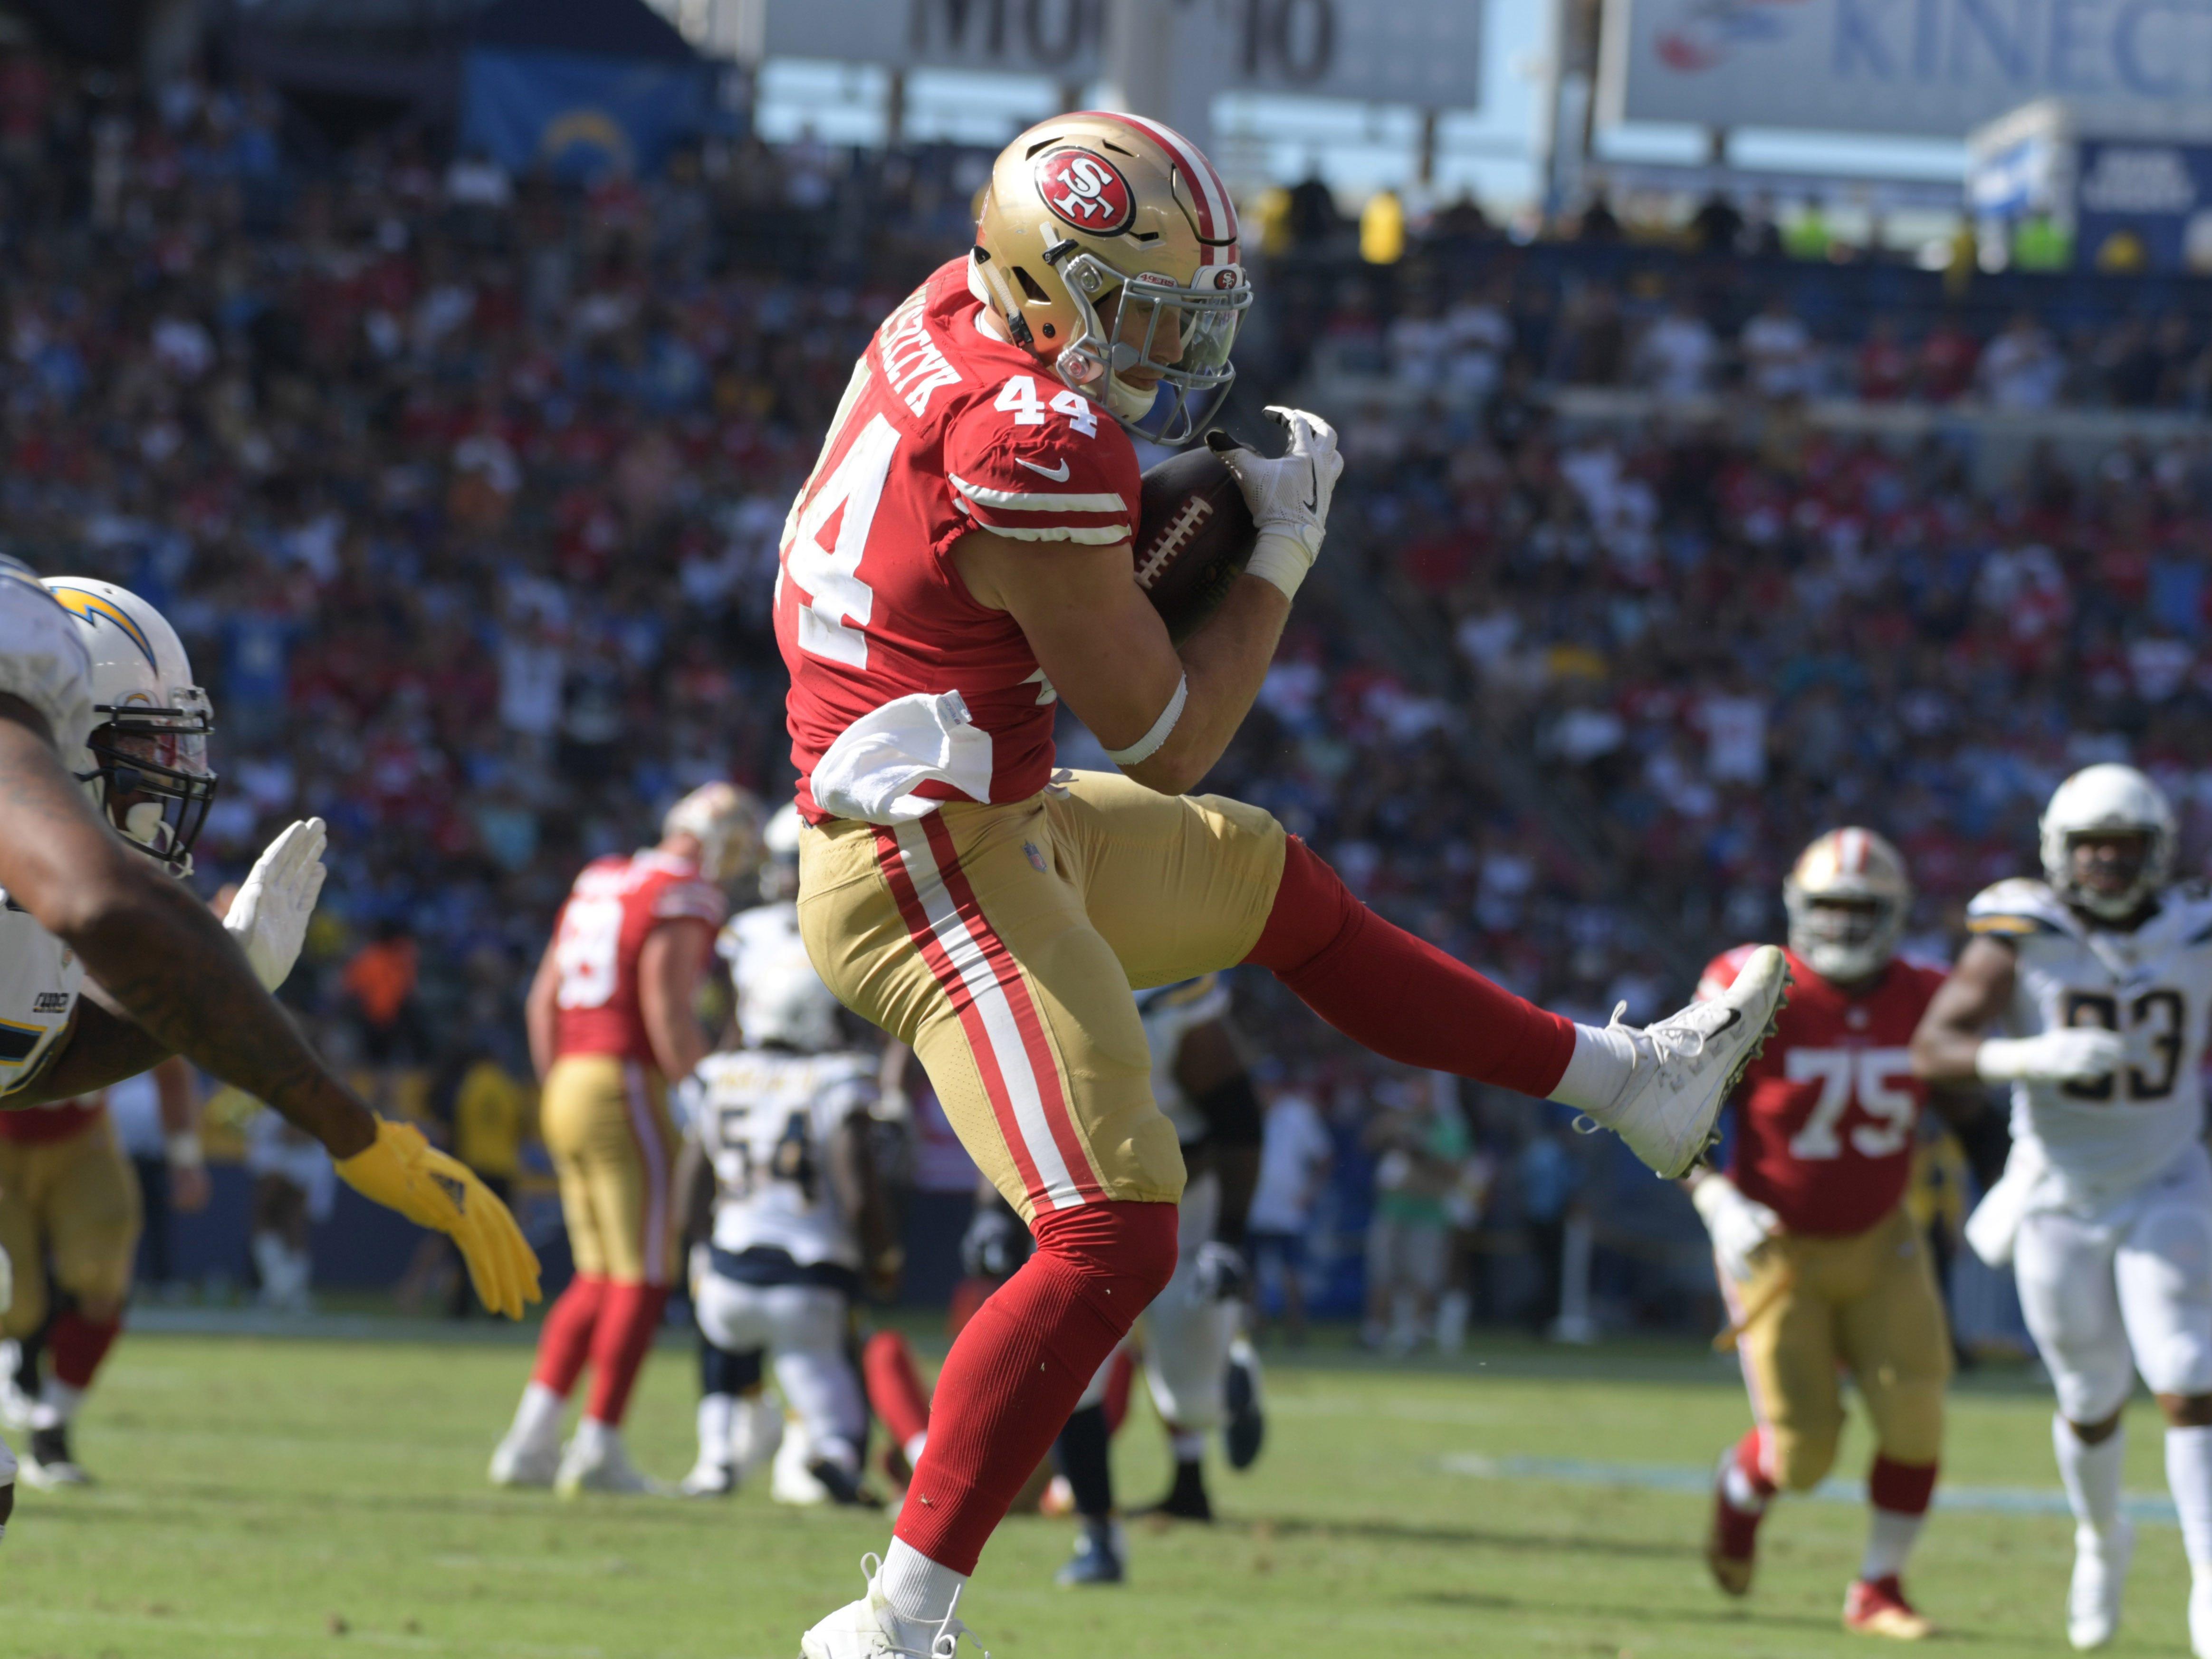 FB - Kyle Juszczyk, San Francisco 49ers